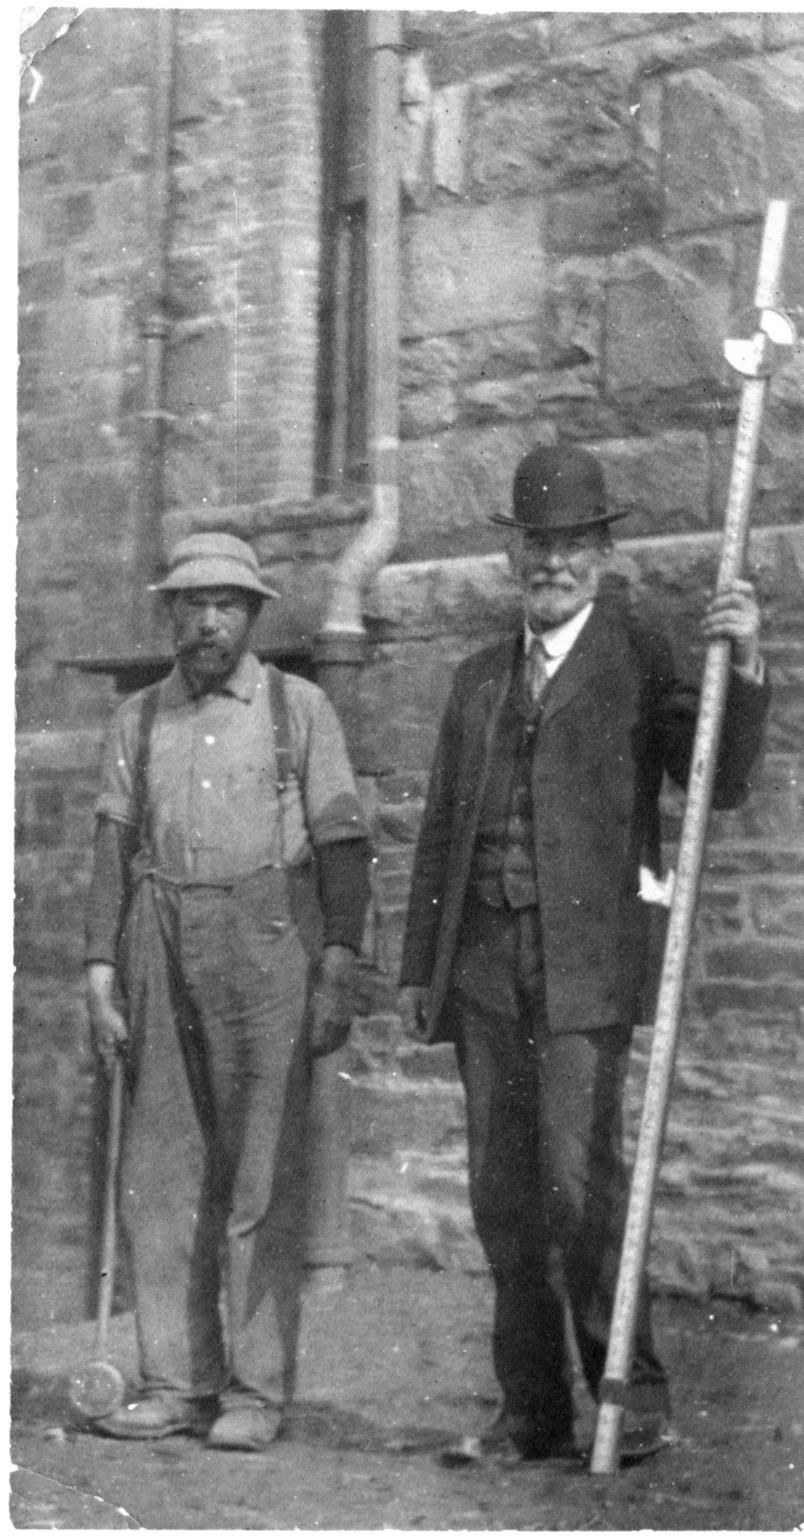 2 men [surveyors]